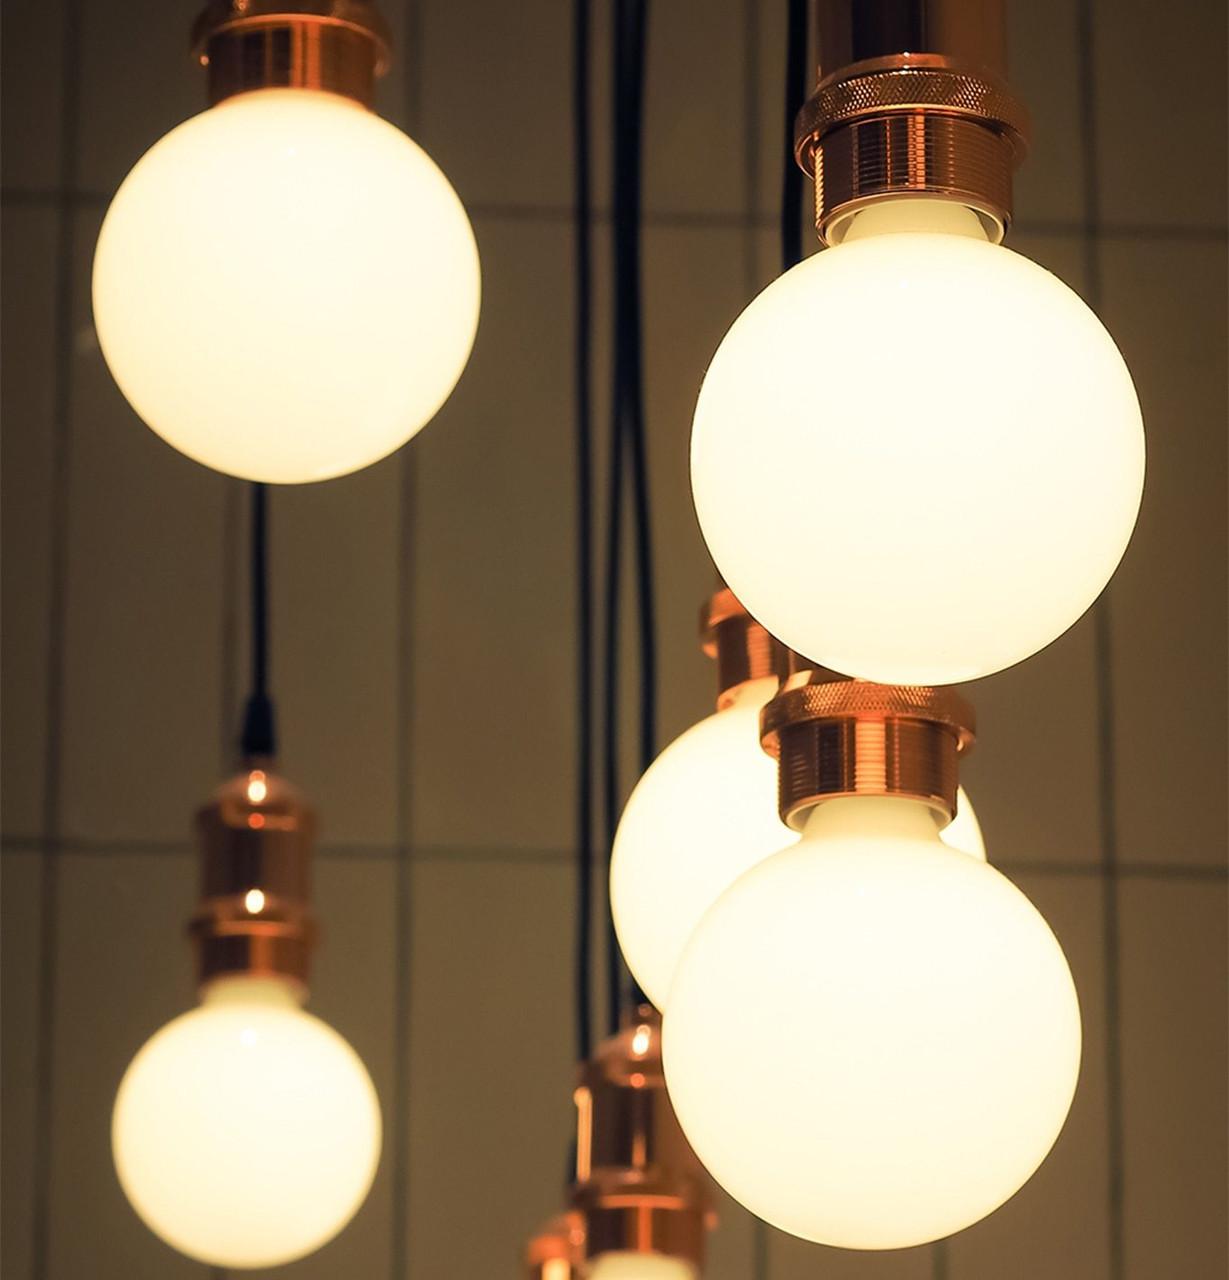 LED Dimmable Globe E27 Light Bulbs